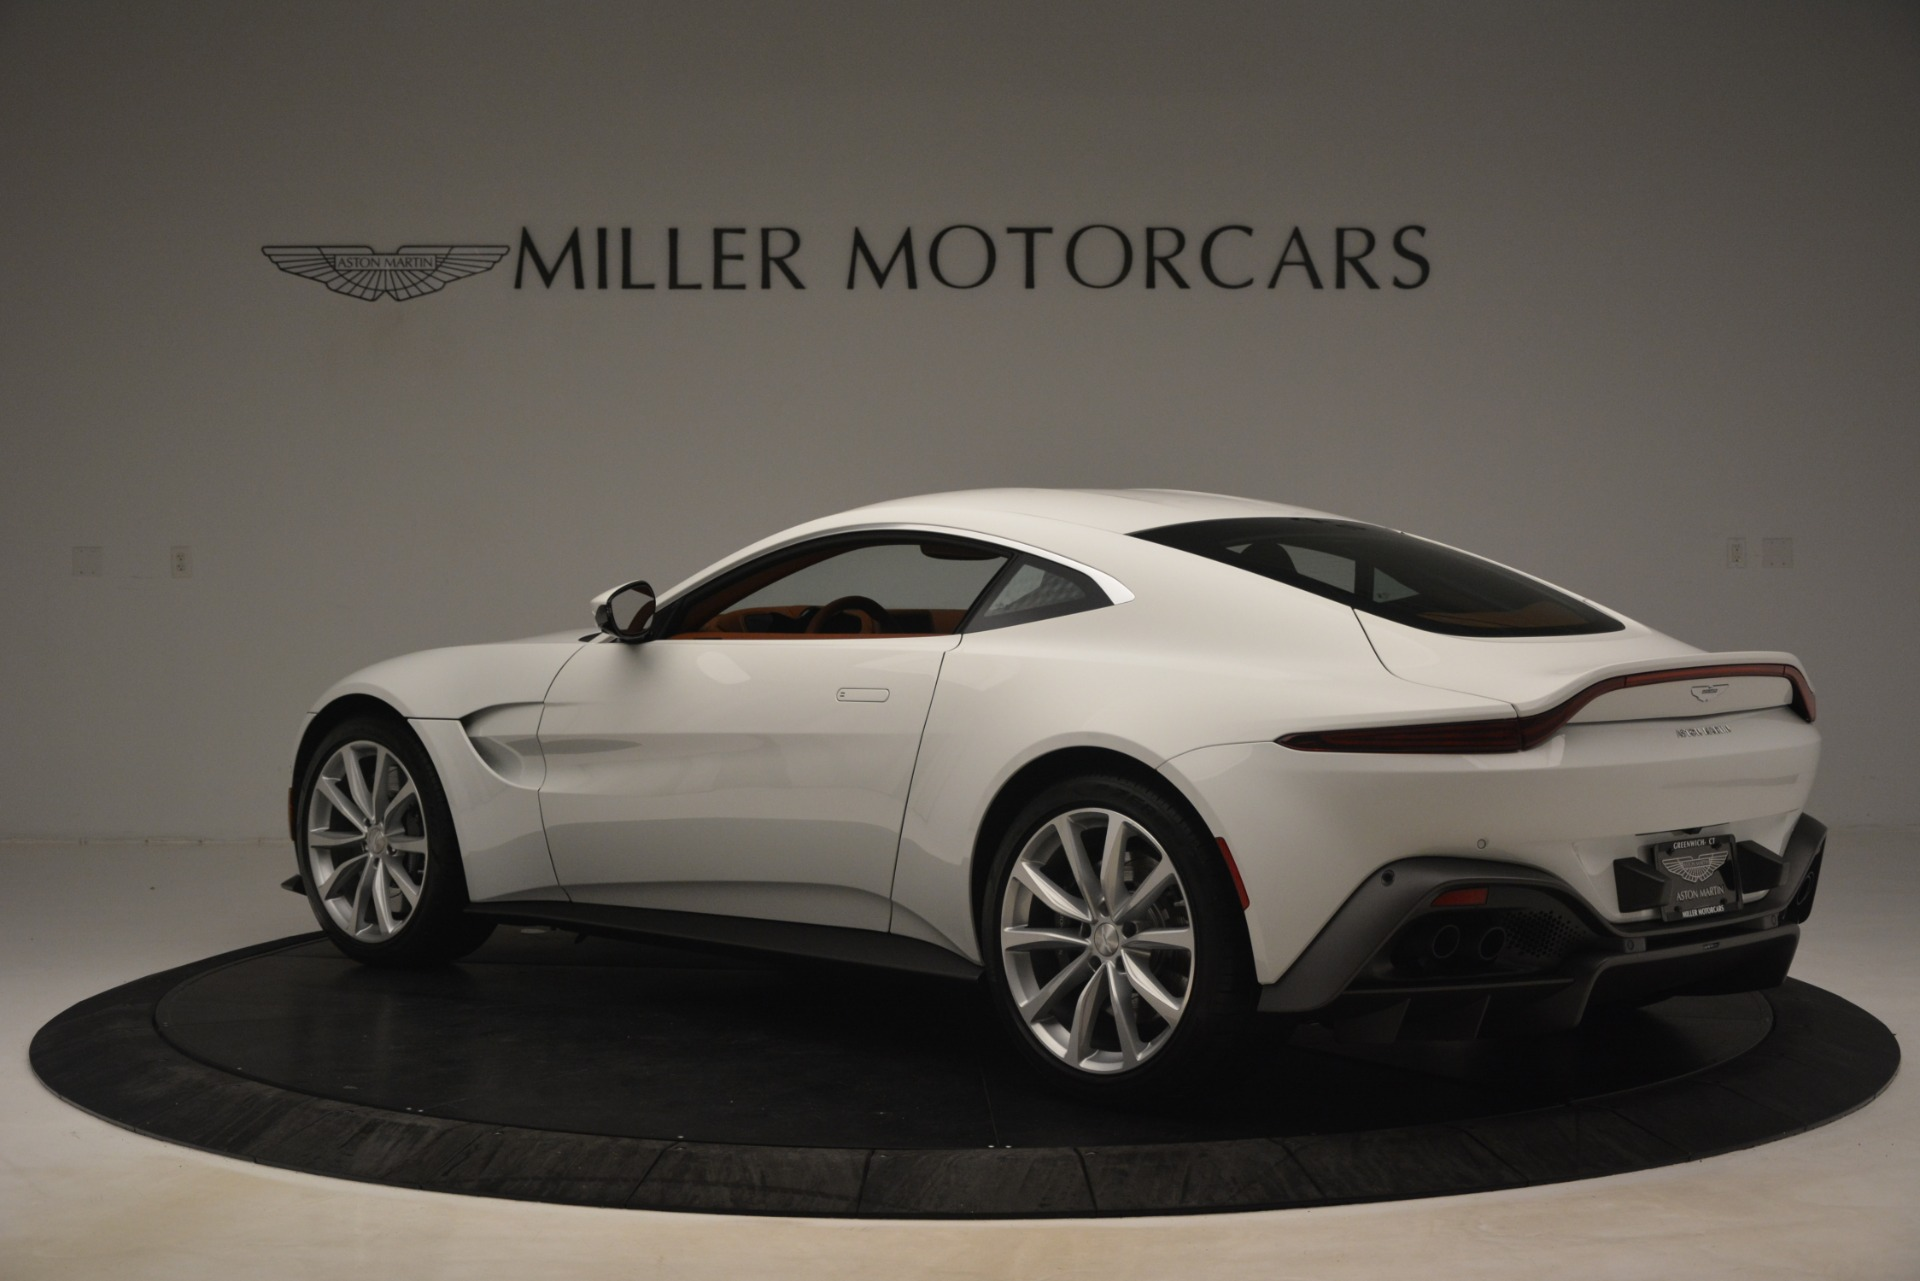 New 2019 Aston Martin Vantage Coupe For Sale In Greenwich, CT. Alfa Romeo of Greenwich, A1373 3227_p3